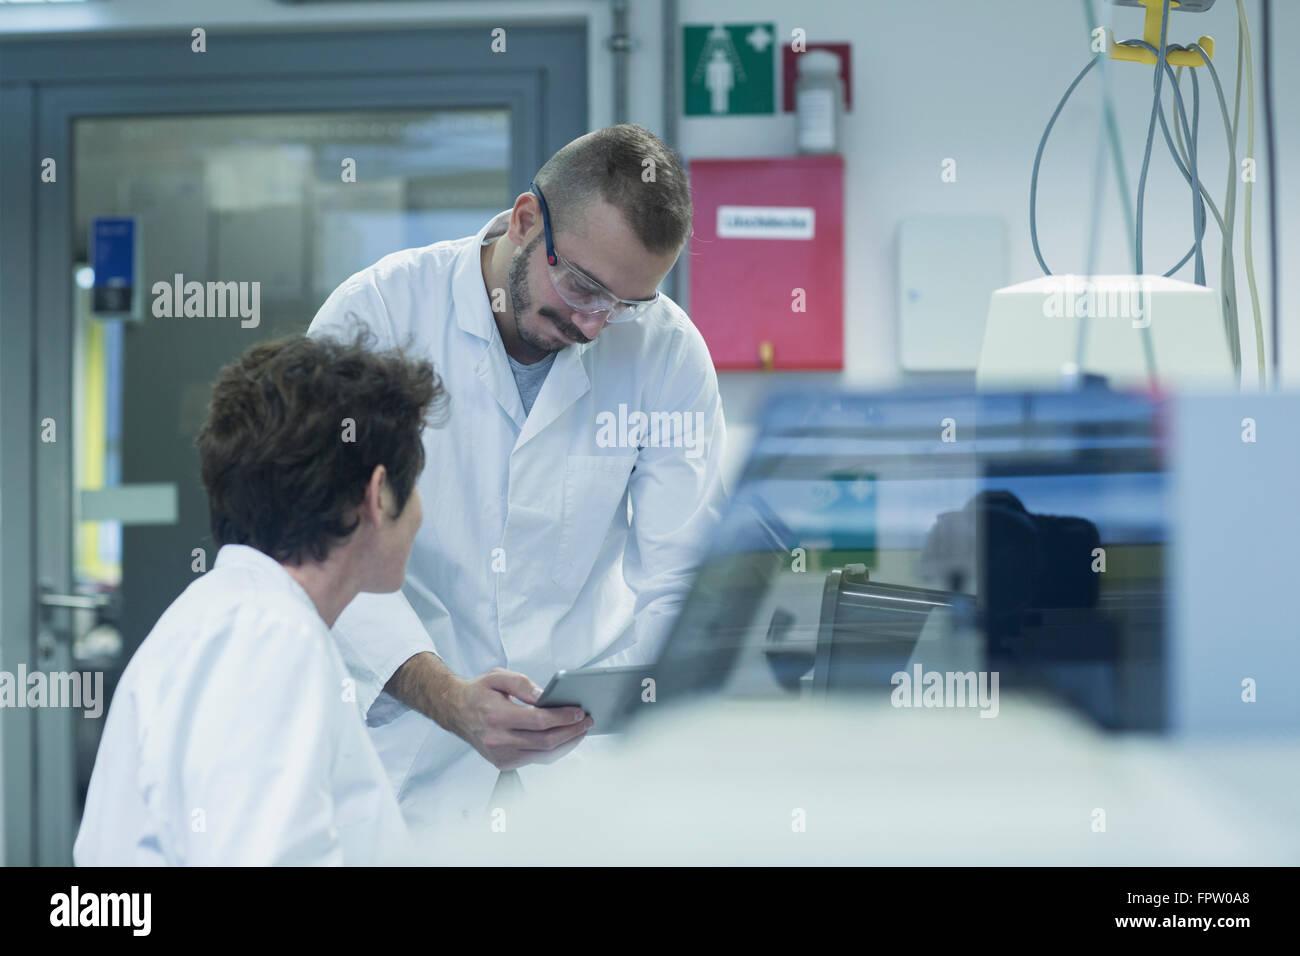 Two scientist working on digital tablet in a pharmacy laboratory, Freiburg Im Breisgau, Baden-Württemberg, - Stock Image